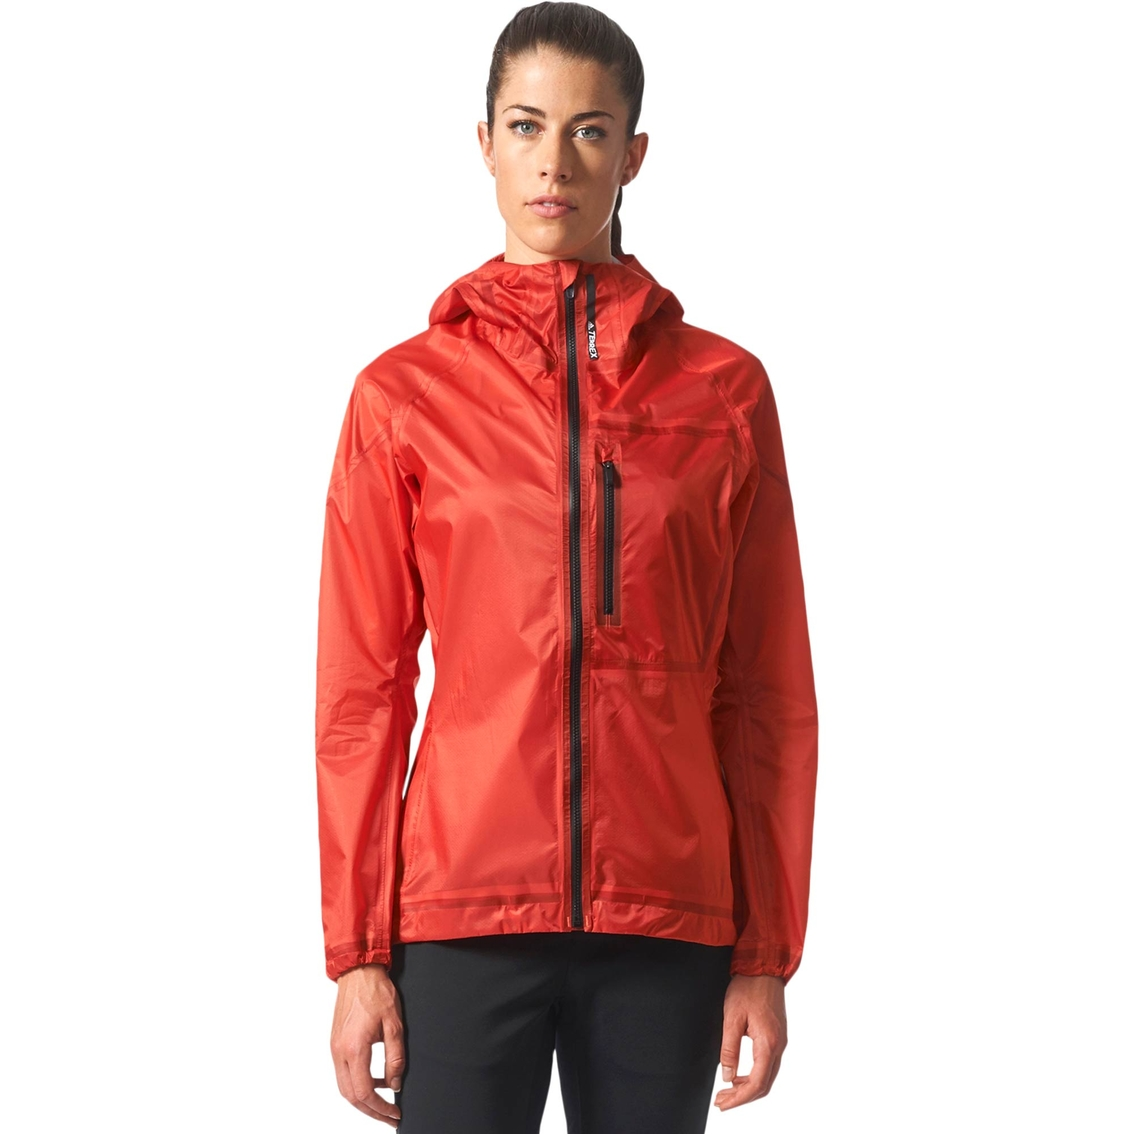 Adidas Outdoor Terrex Agravic 3l Jacket   Jackets   Apparel